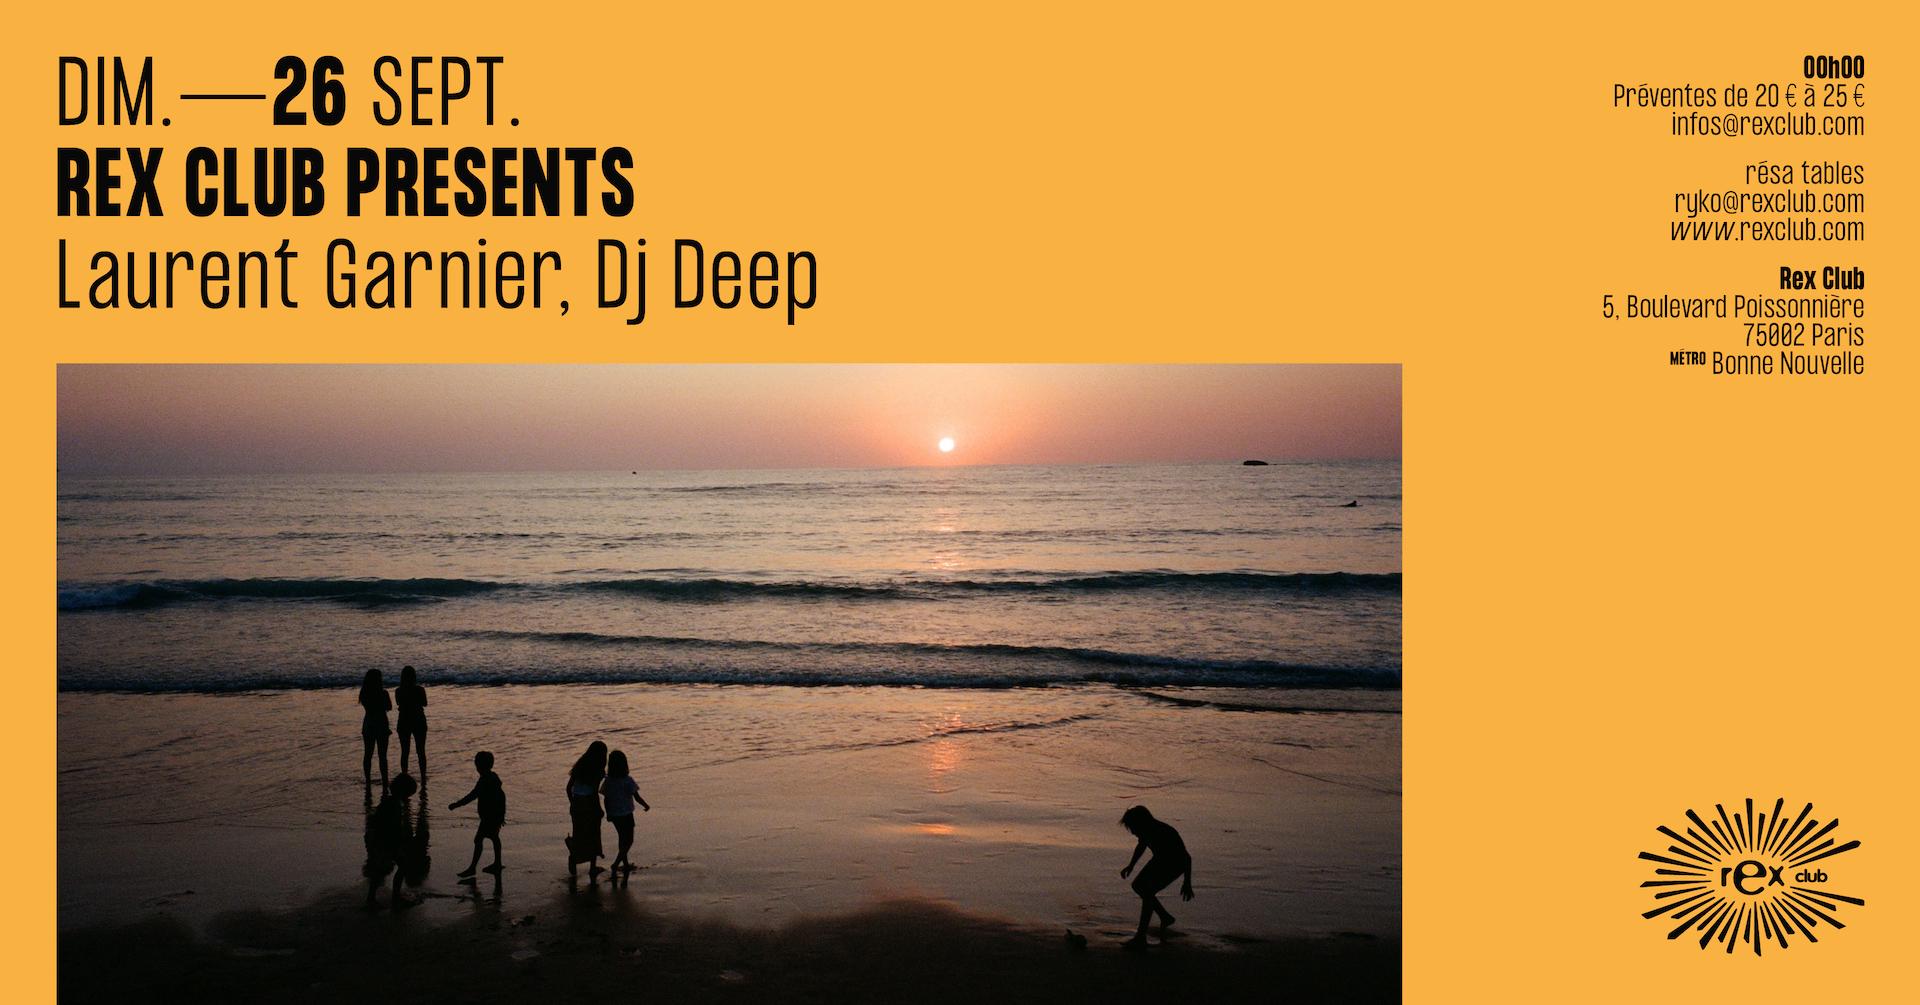 REX CLUB PRESENTS : LAURENT GARNIER, DJ DEEP